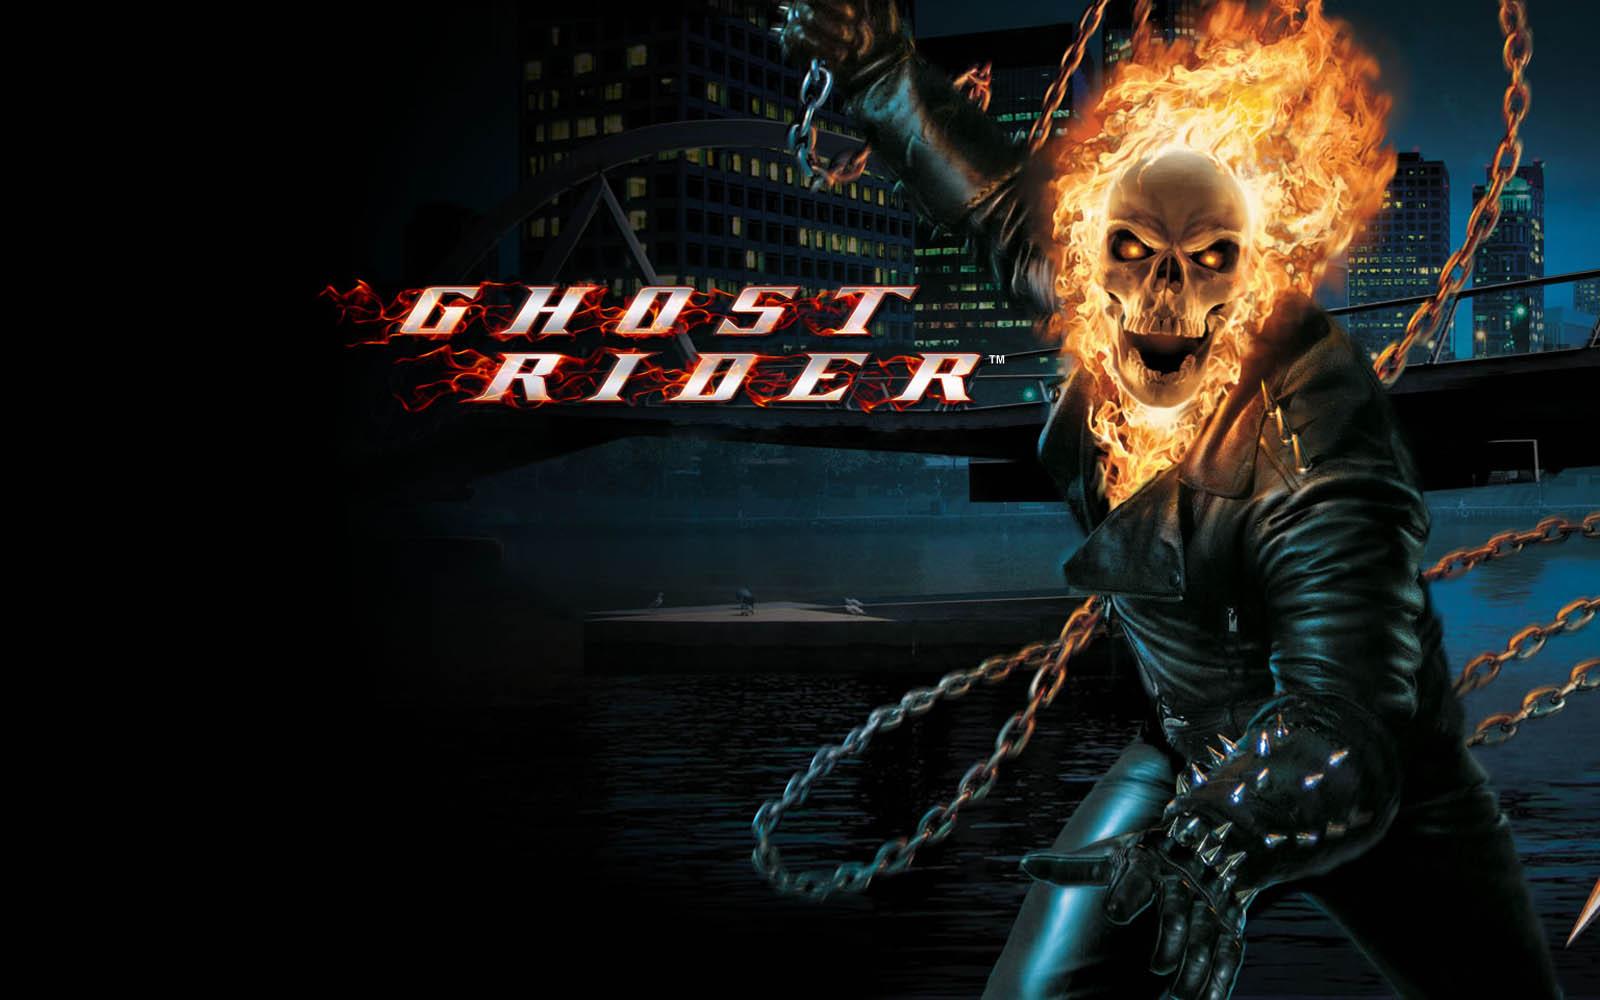 Top Wallpaper Mobile Ghost Rider - latest?cb\u003d20161211185641  Snapshot_807359.jpg/revision/latest?cb\u003d20161211185641